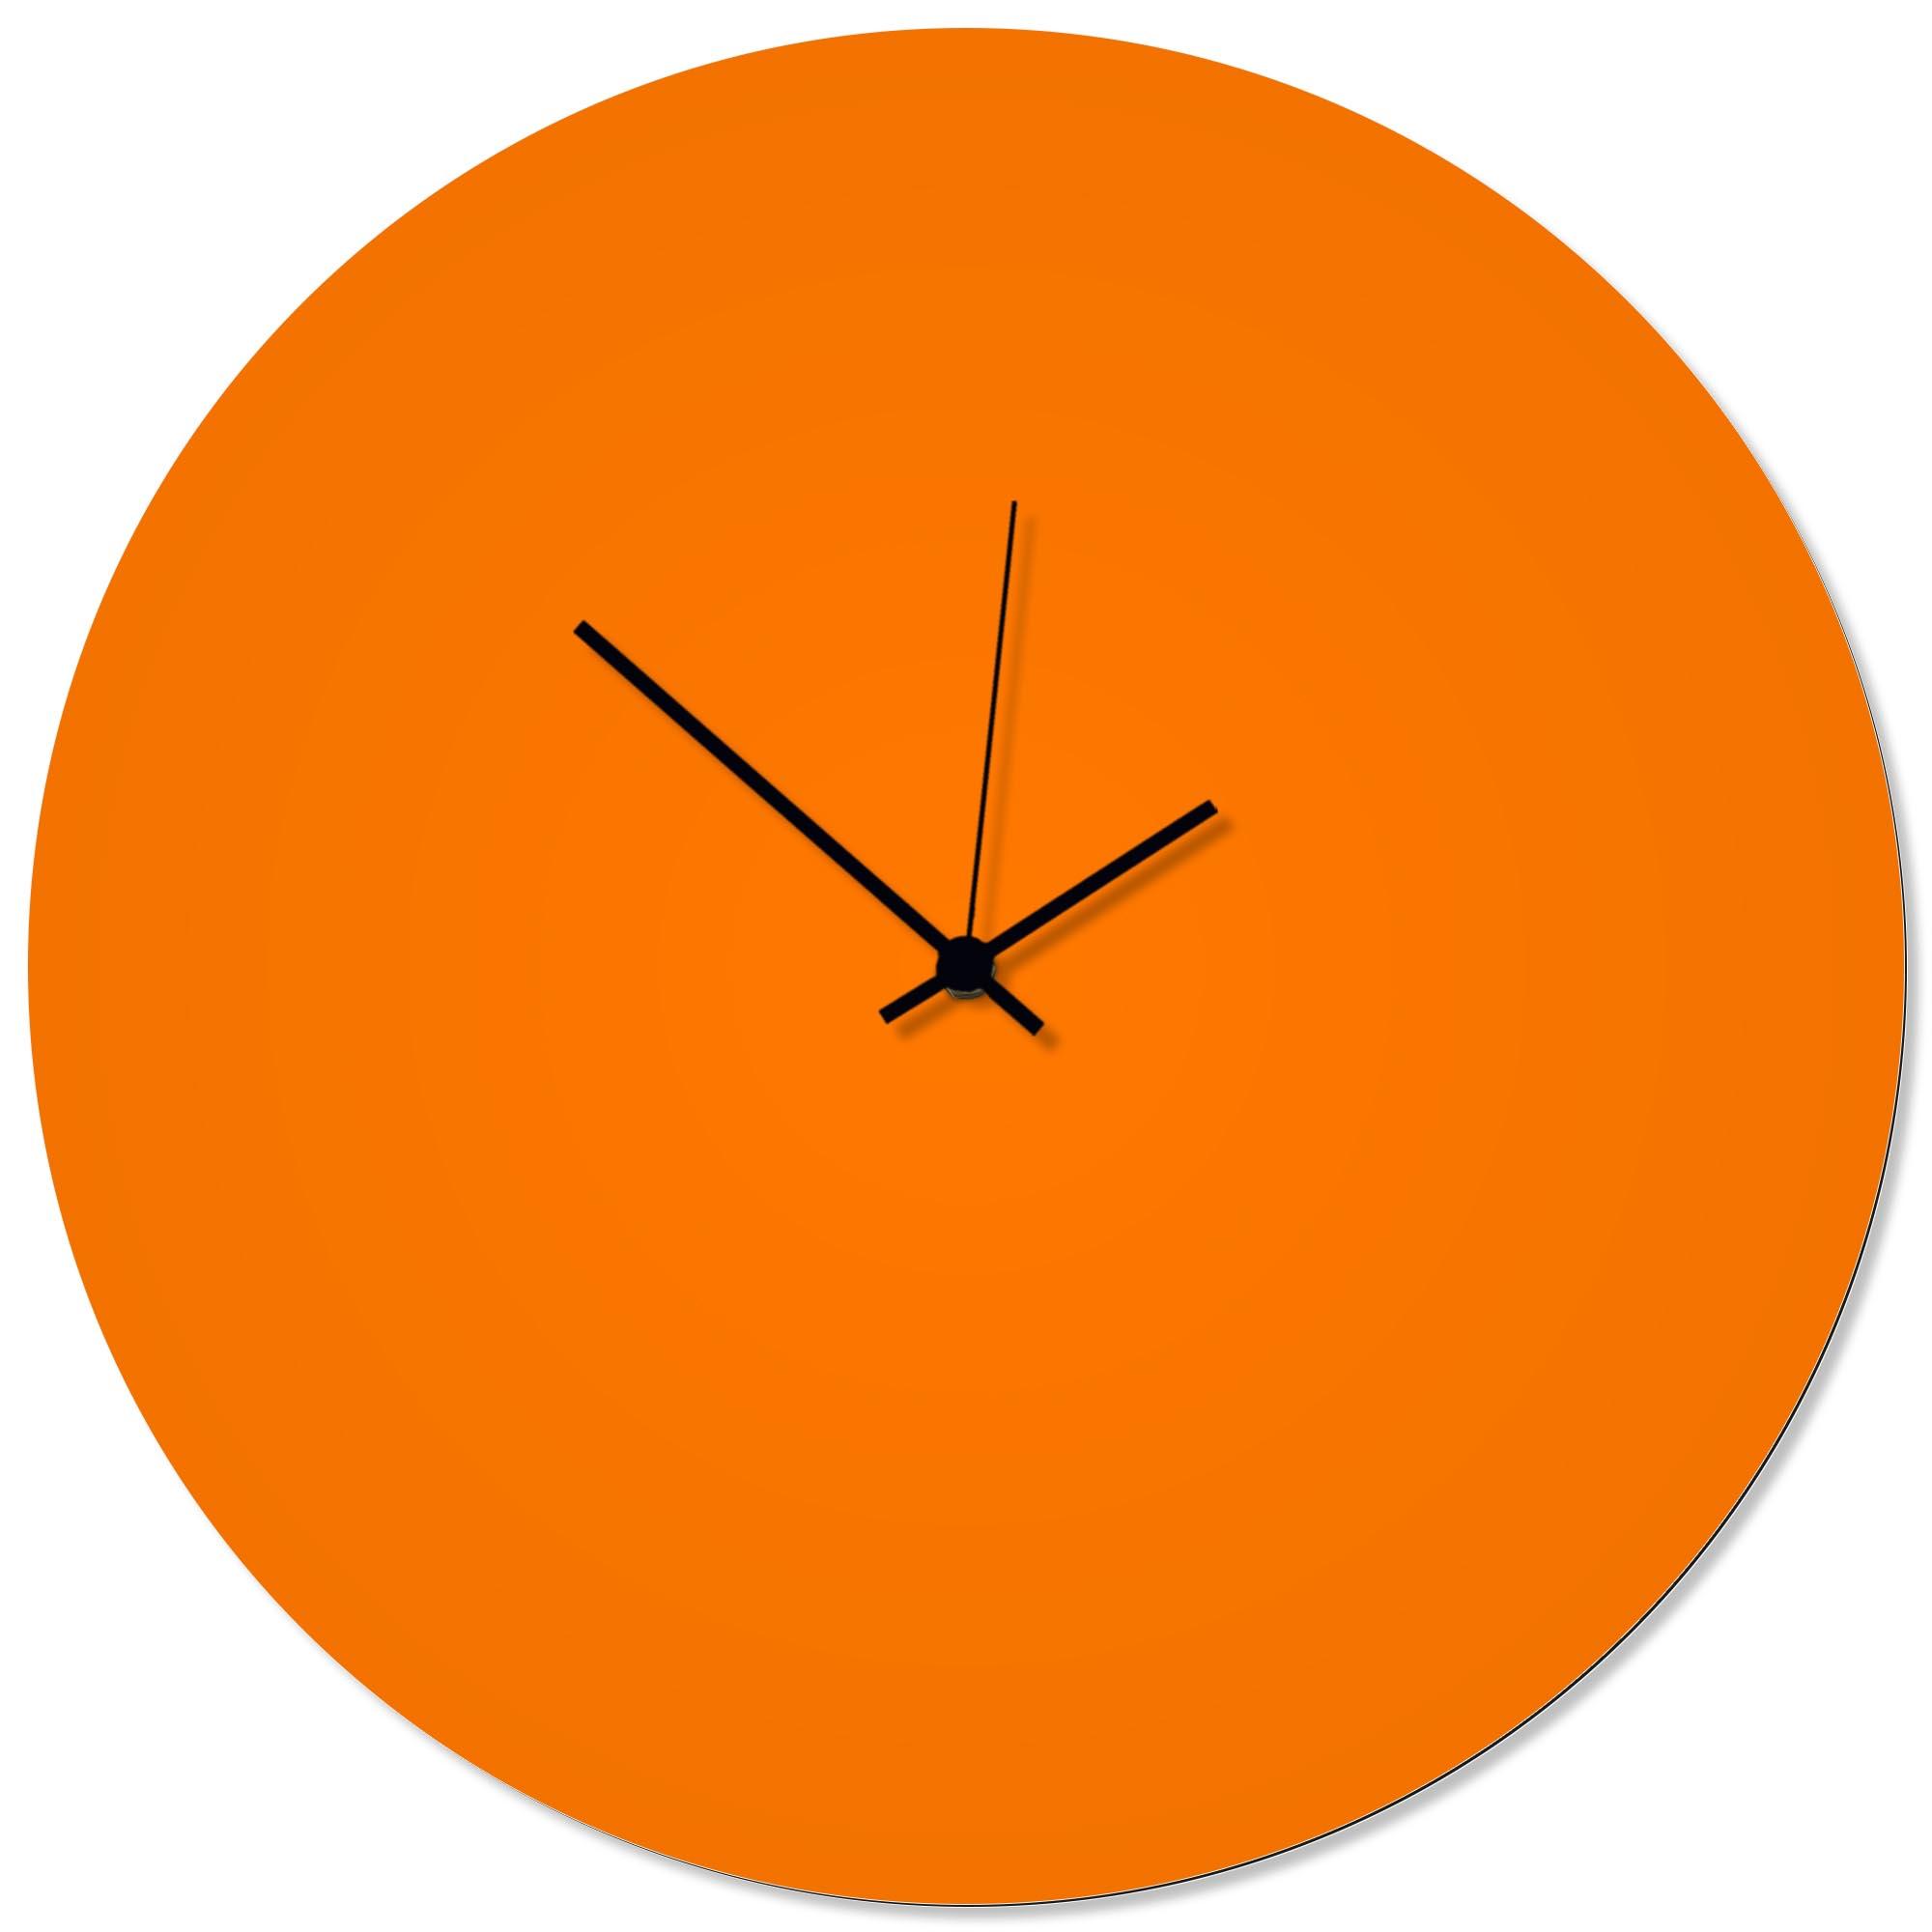 Orangeout Black Circle Clock Large 23x23in. Aluminum Polymetal